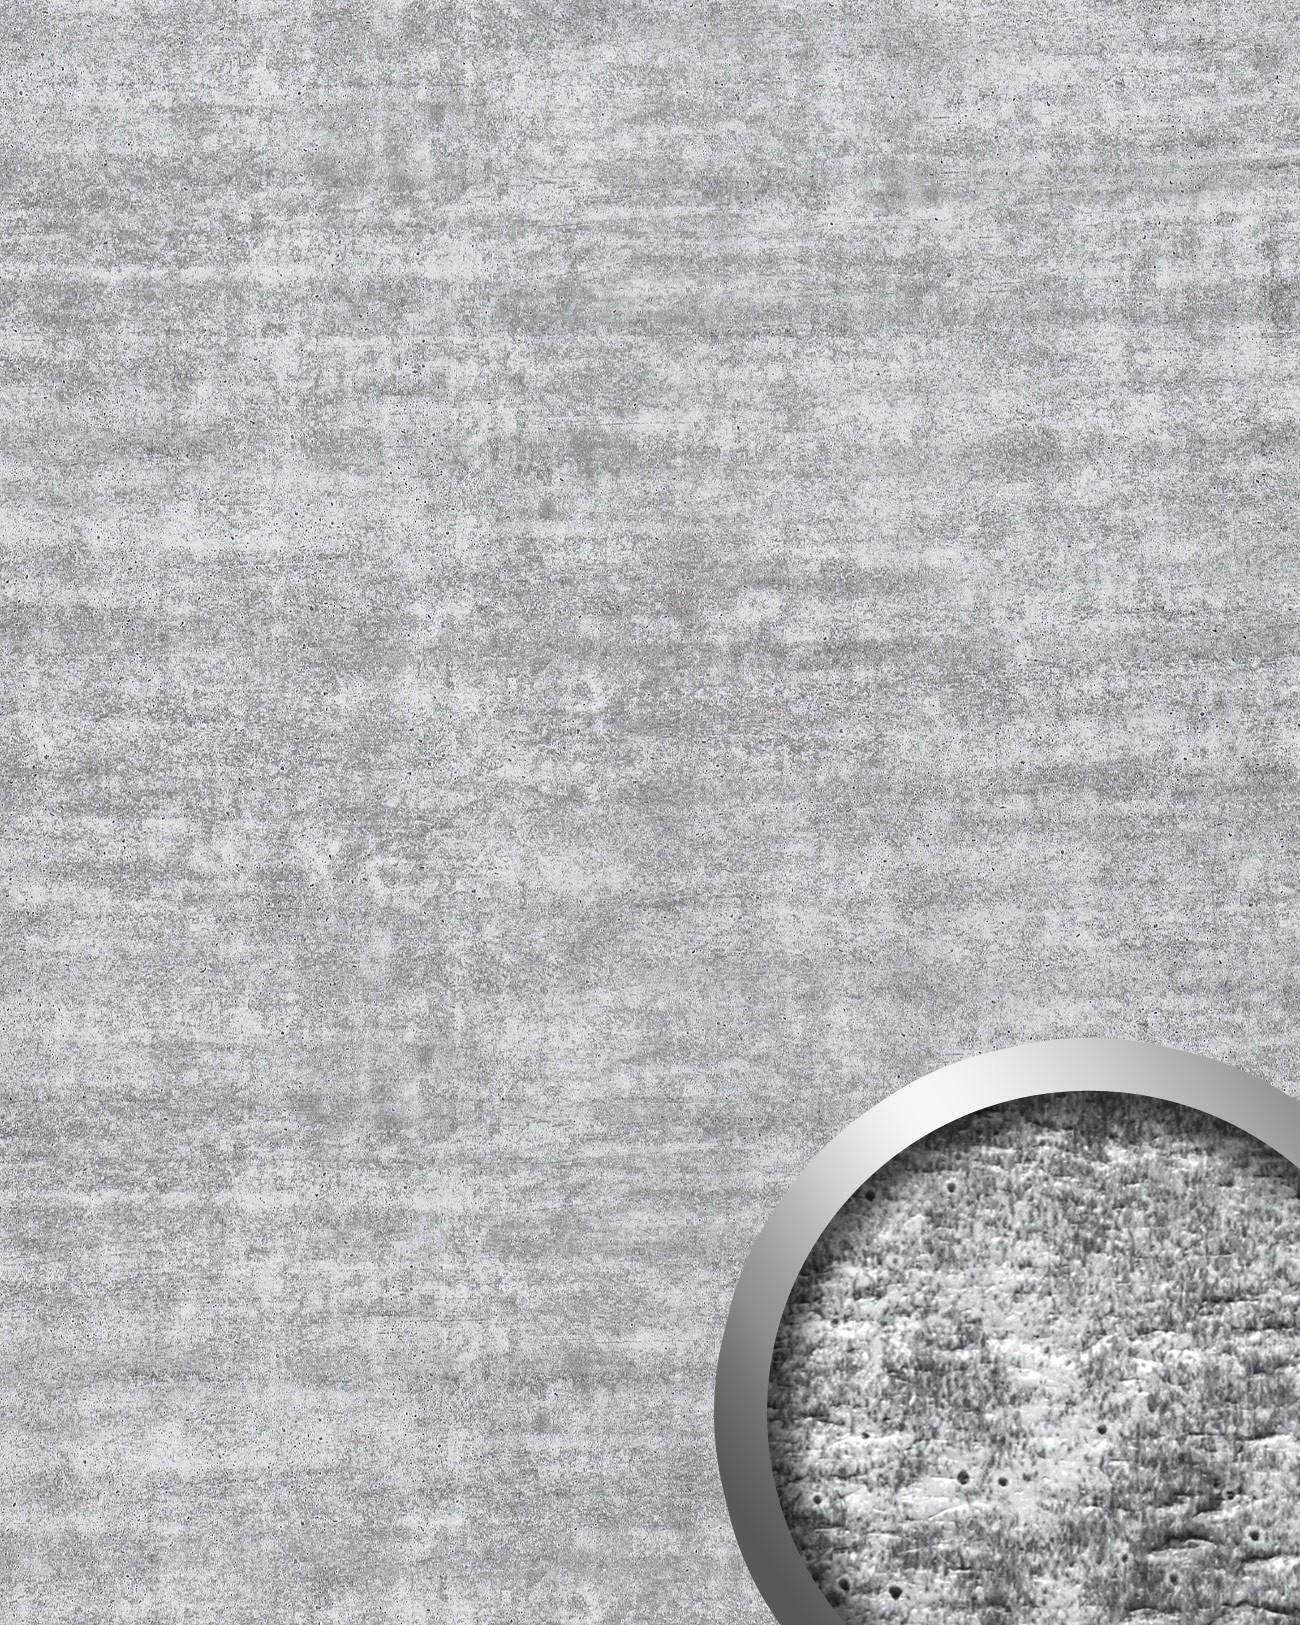 Super Wandpaneel Platte Beton Optik WallFace 16429 URBAN Design YU91